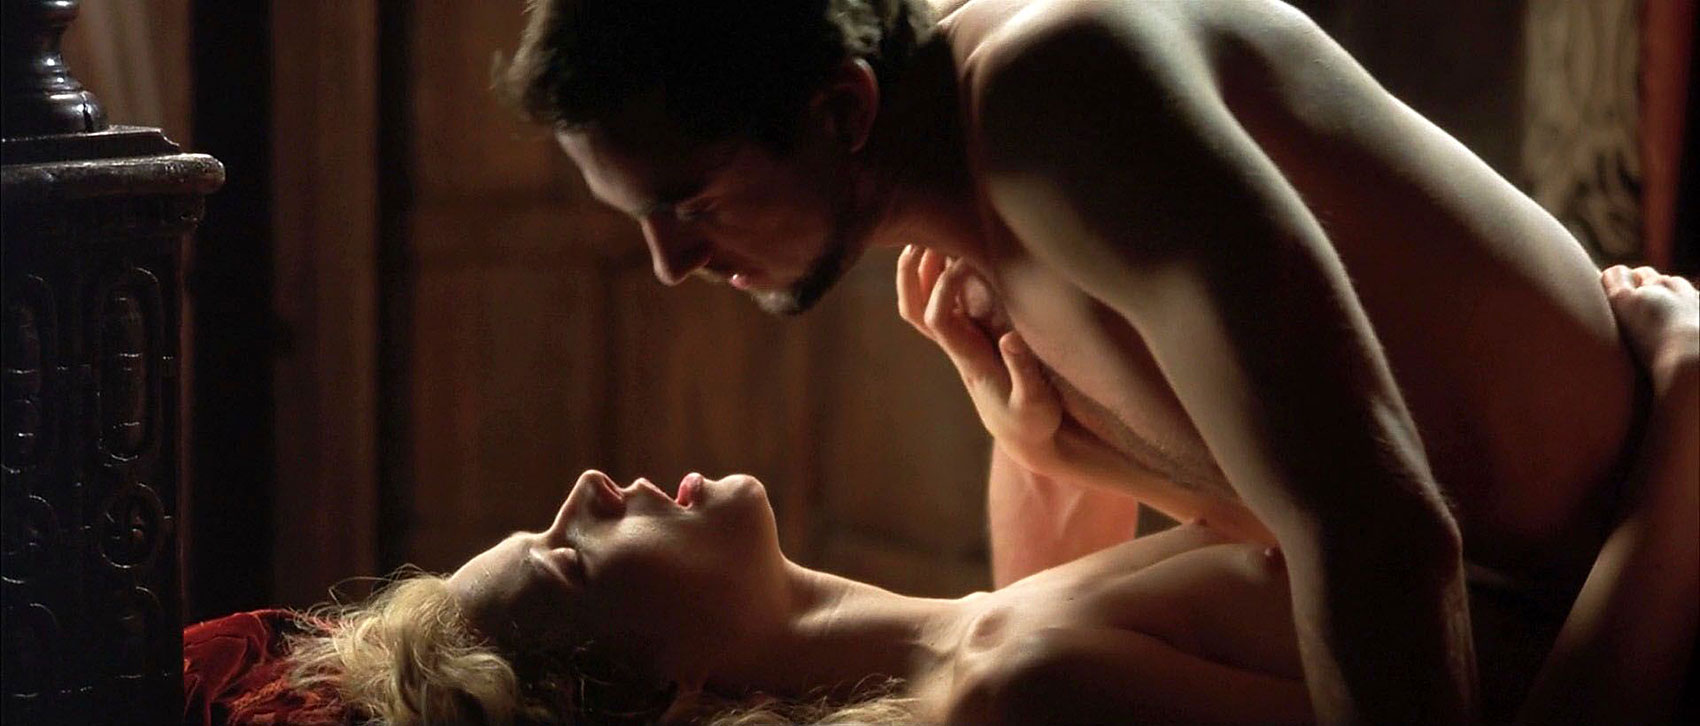 nude gwyneth paltrow hot pics